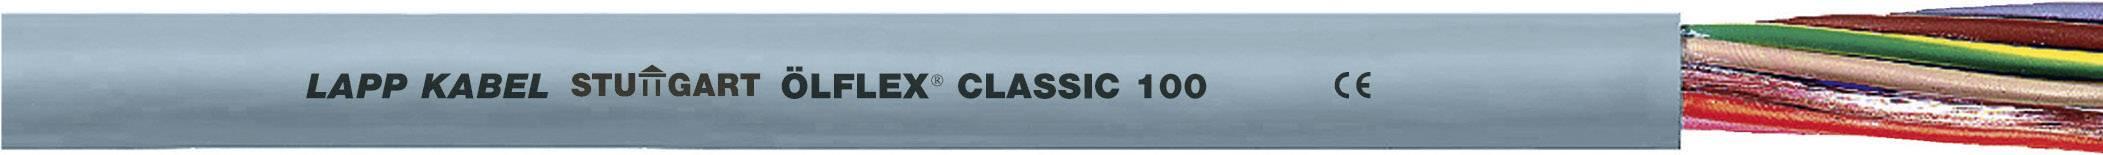 Kabel LappKabel Ölflex CLASSIC 100 3G16 (0010302), PVC, 18,3 mm, 750 V, šedá, 500 m